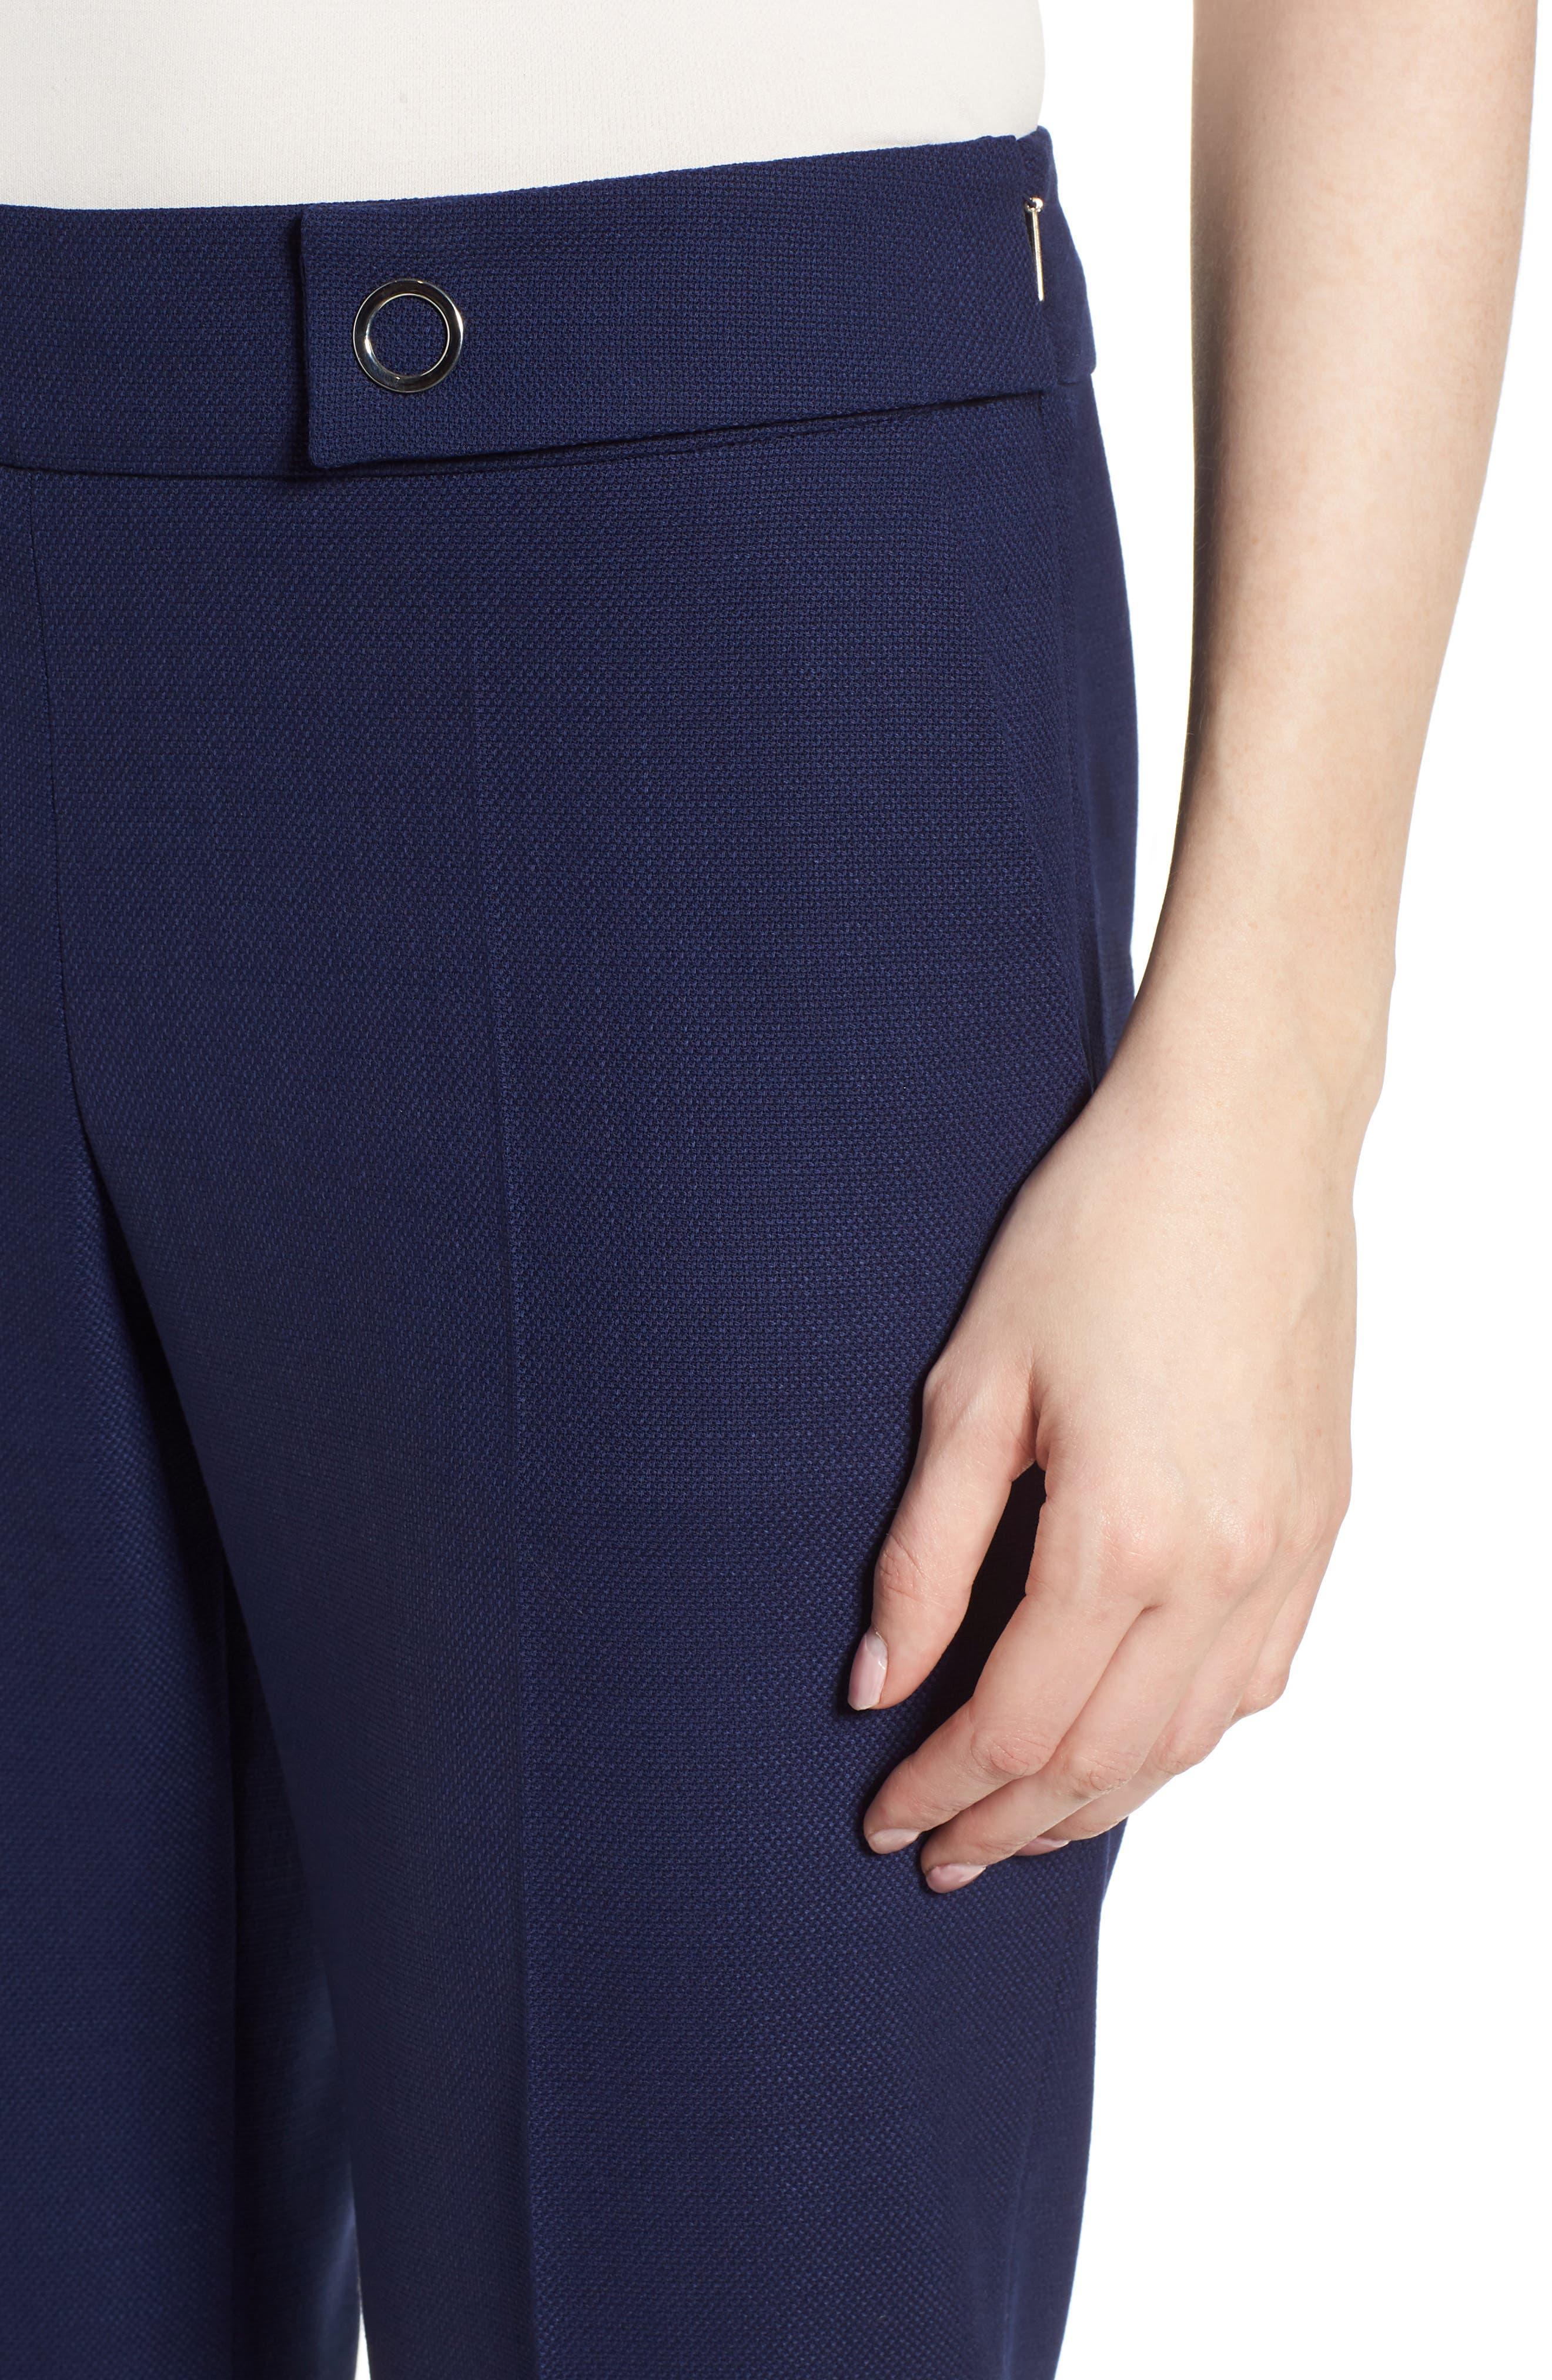 Tibalena Textured Stretch Wool Suit Pants,                             Alternate thumbnail 4, color,                             425